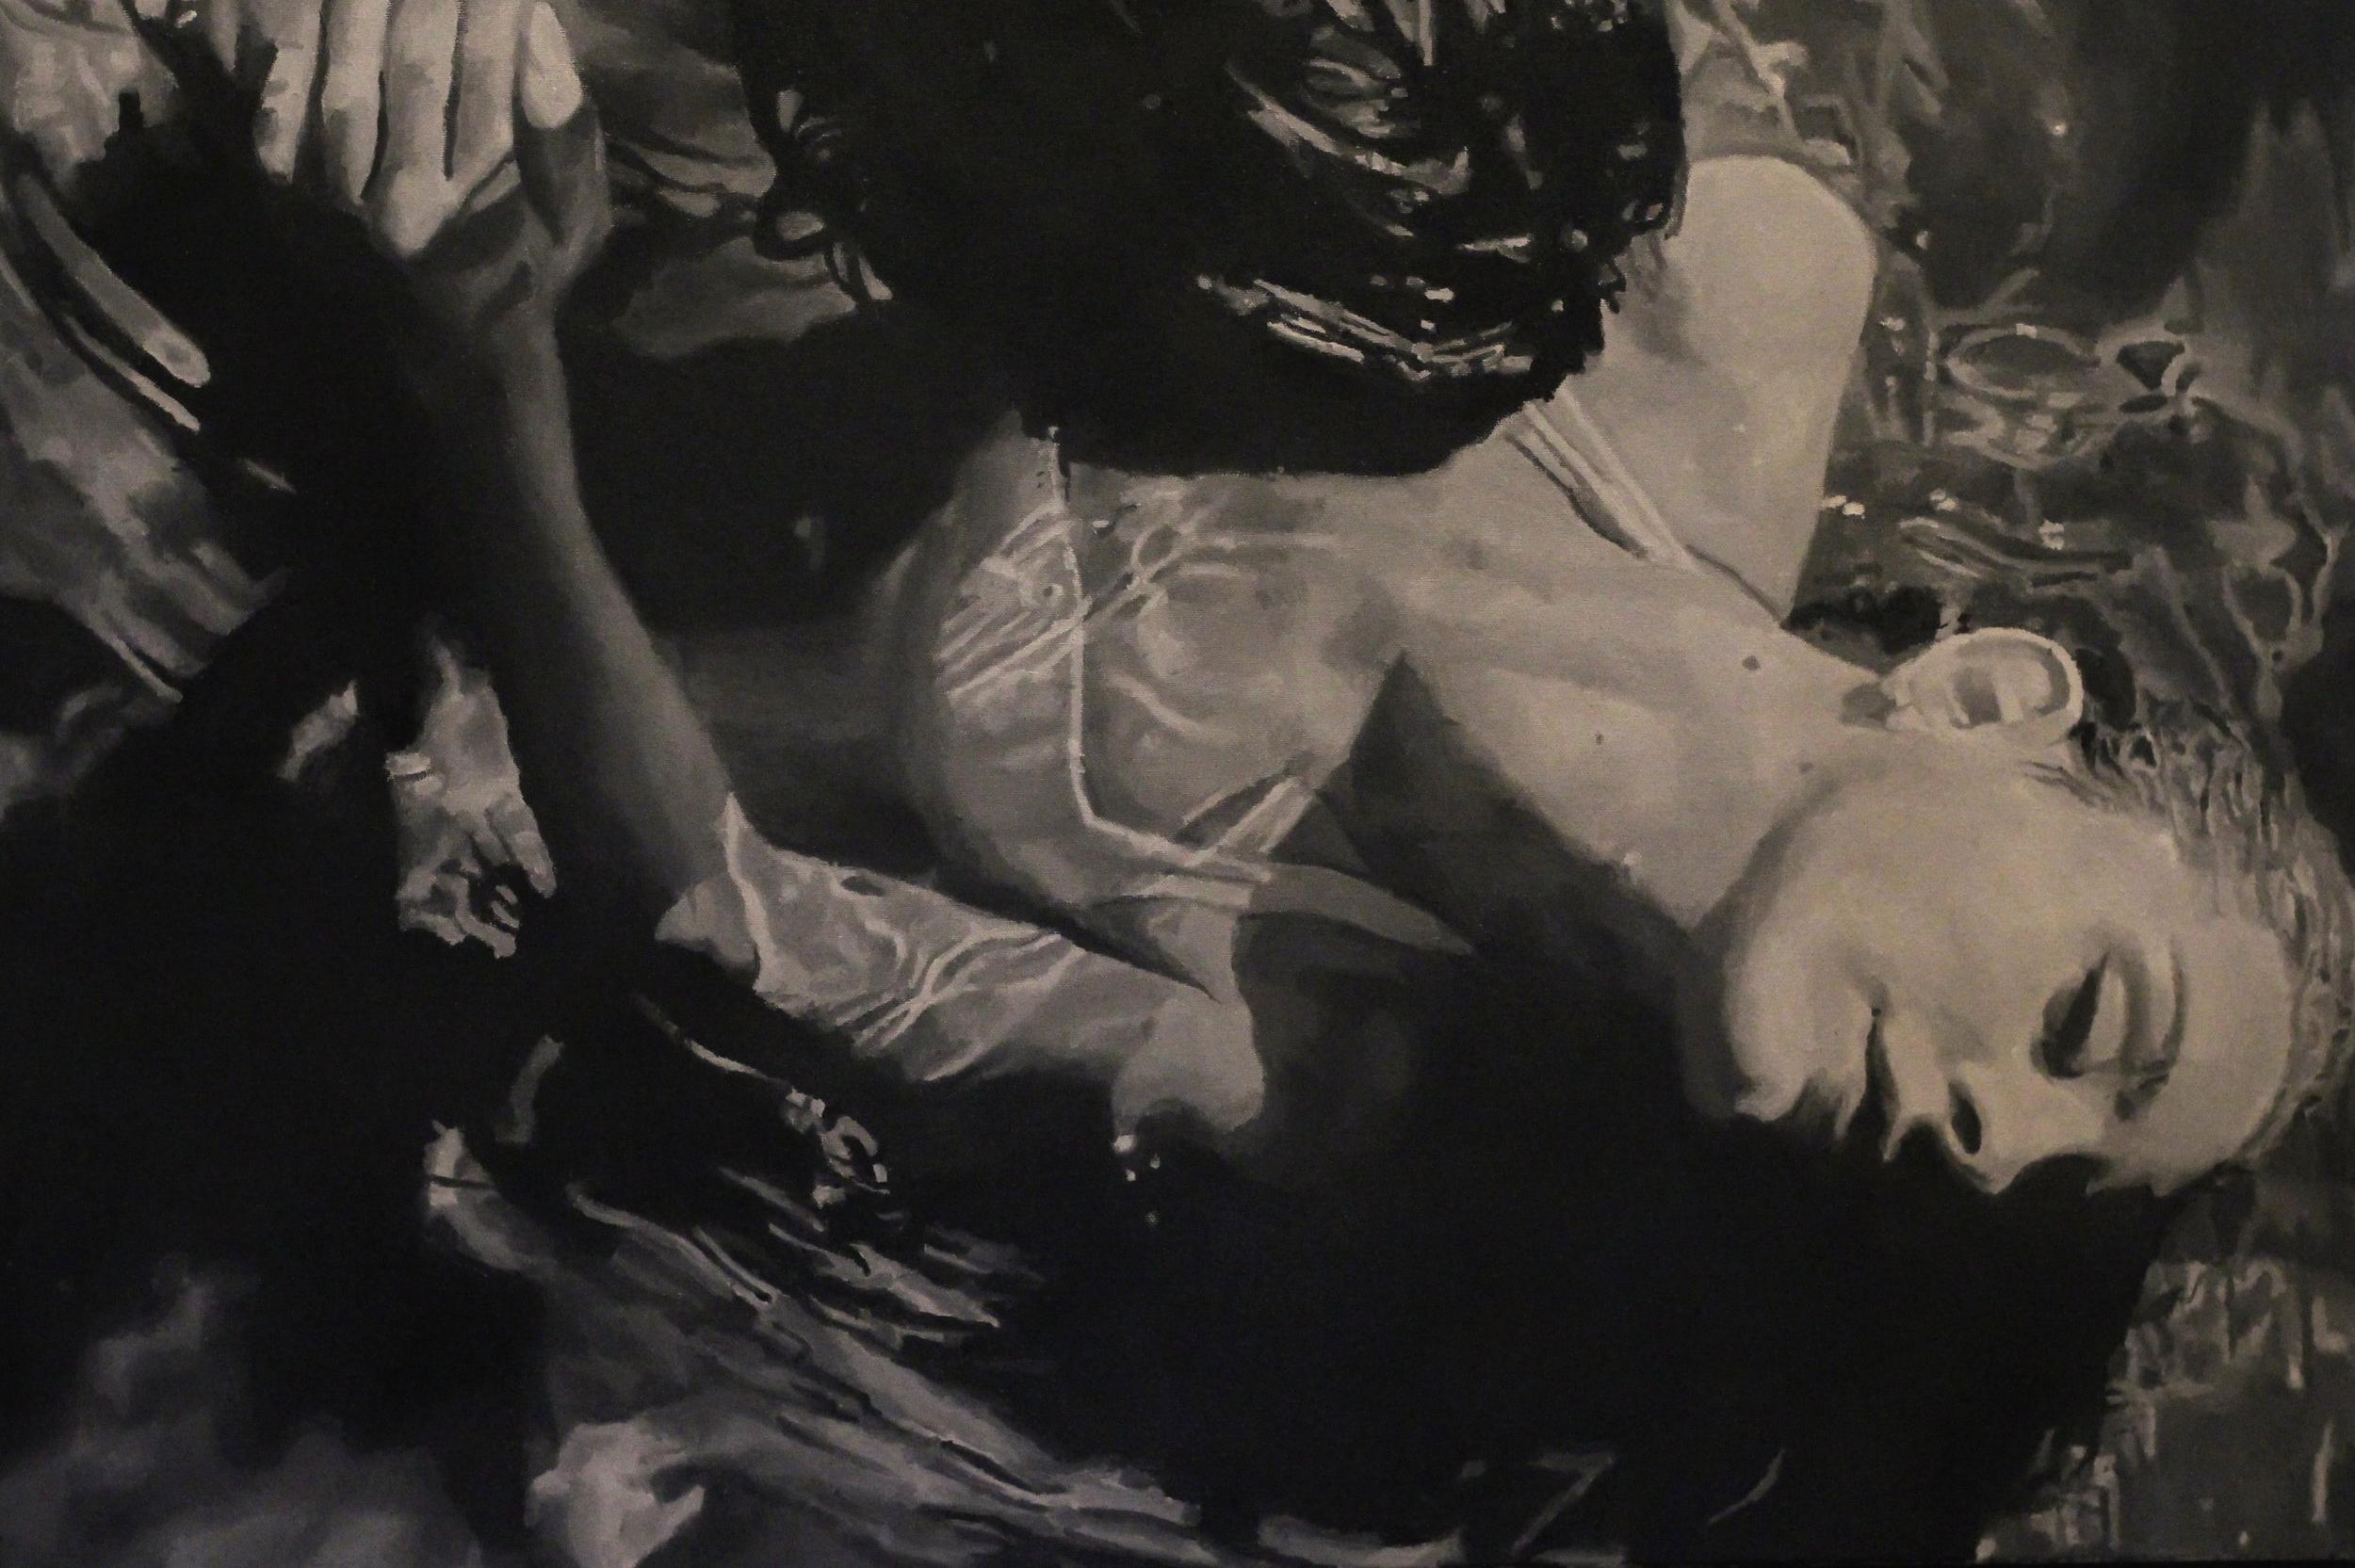 Daydreamer, oil painting  by Jason Nunn (Suffolk, UK)